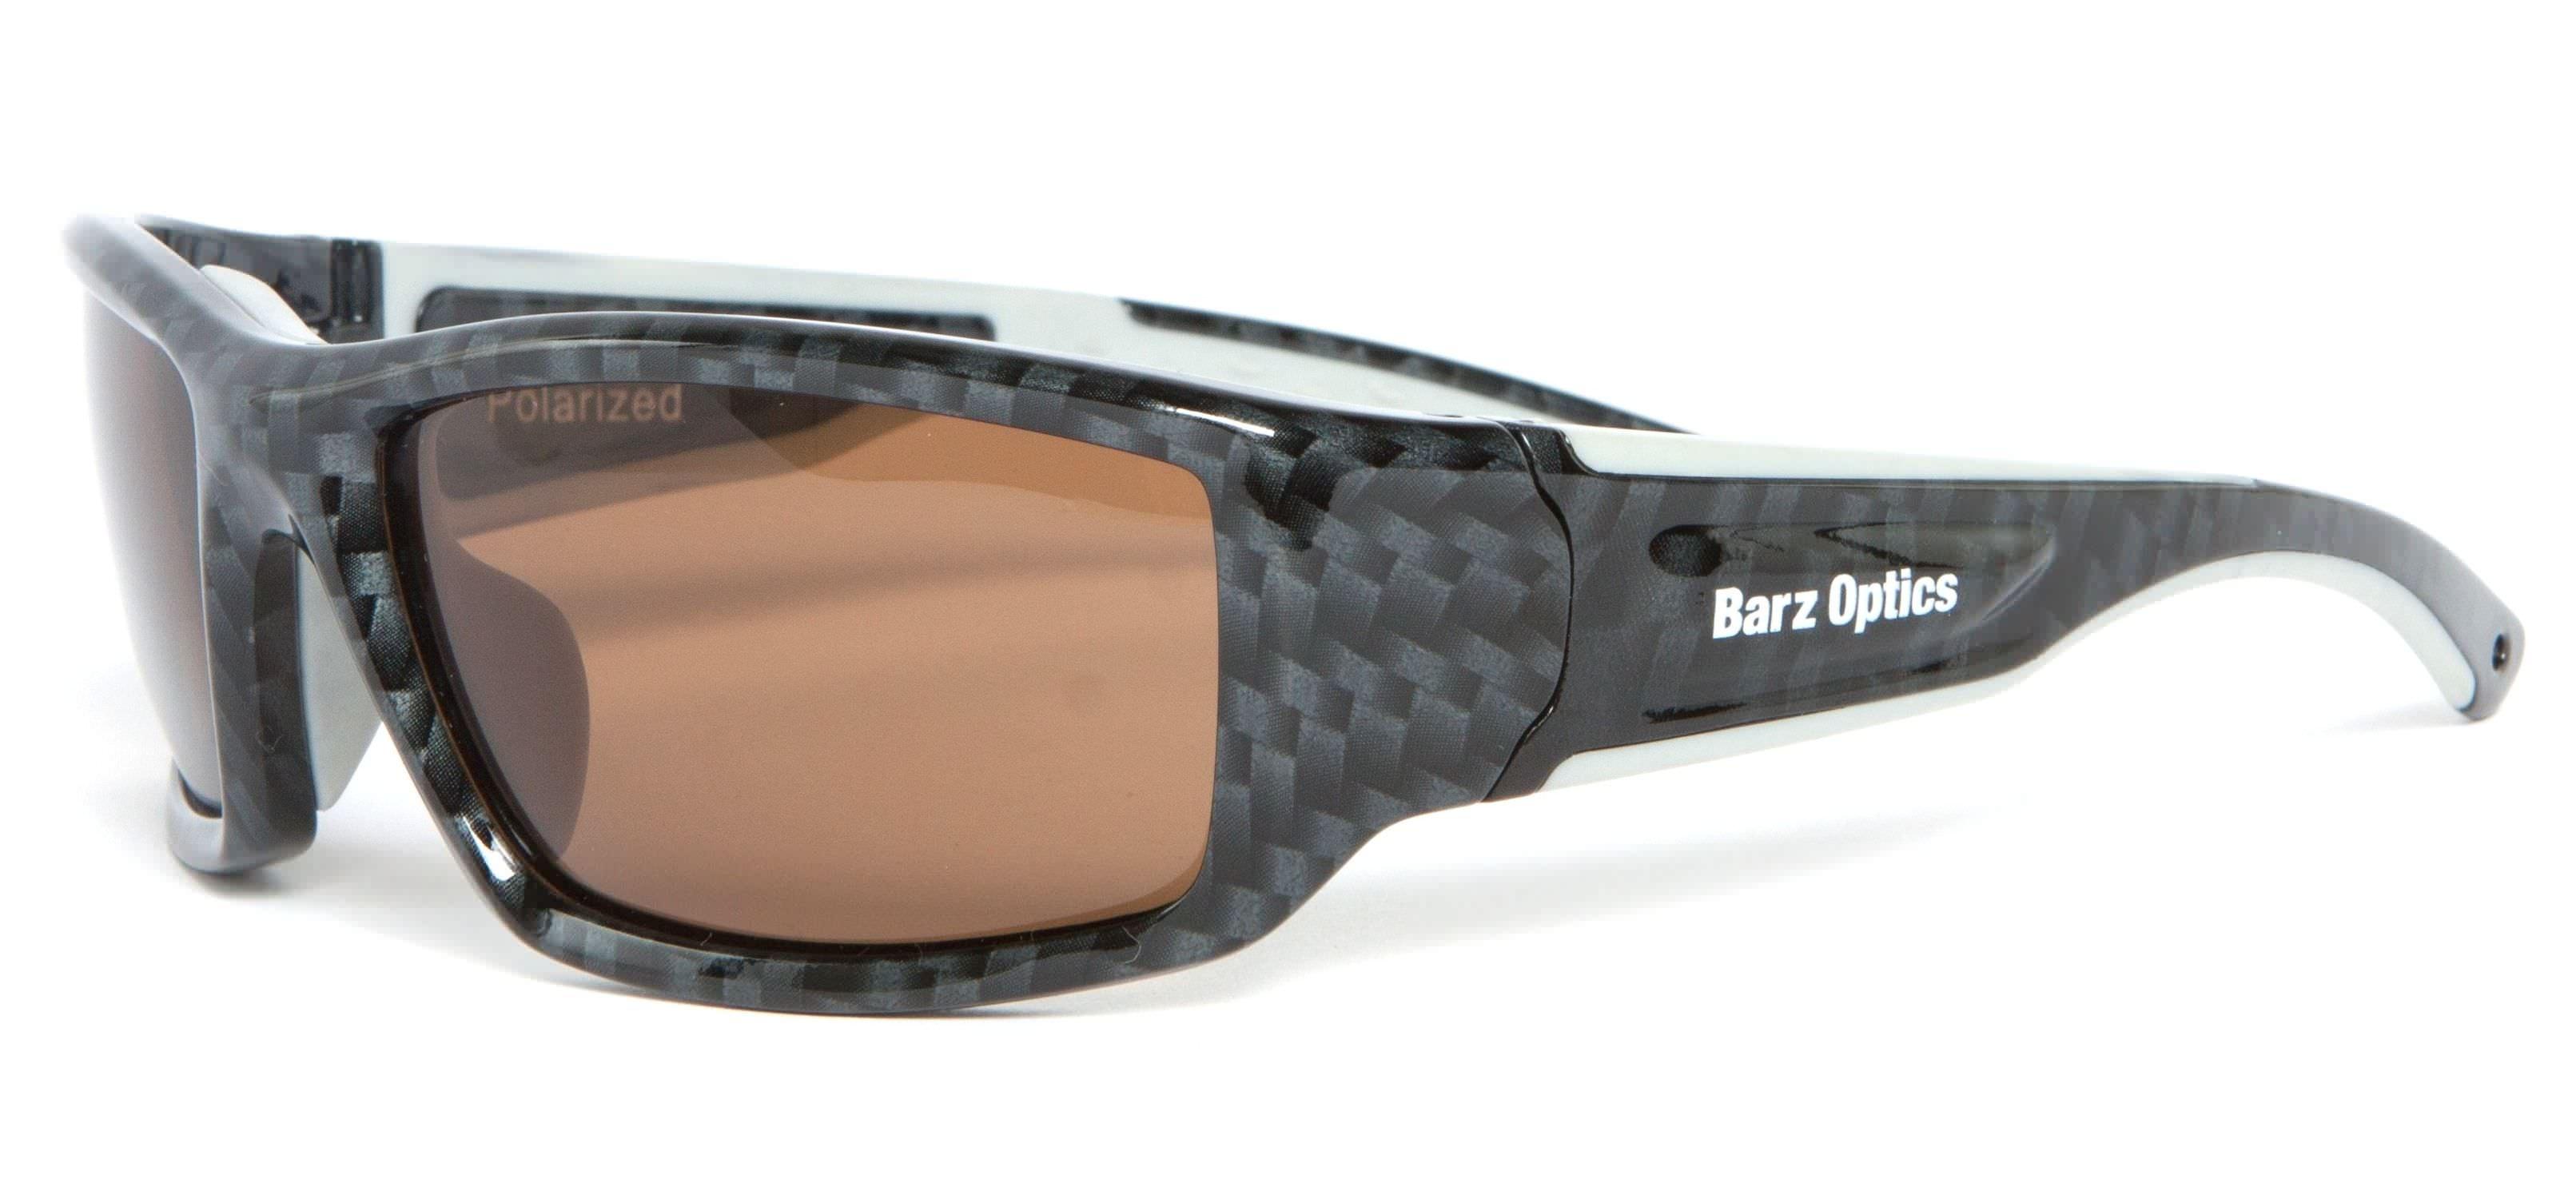 0e2735e518732 Floating sunglasses   polarized   watersports - FLOATER ACETATE ...